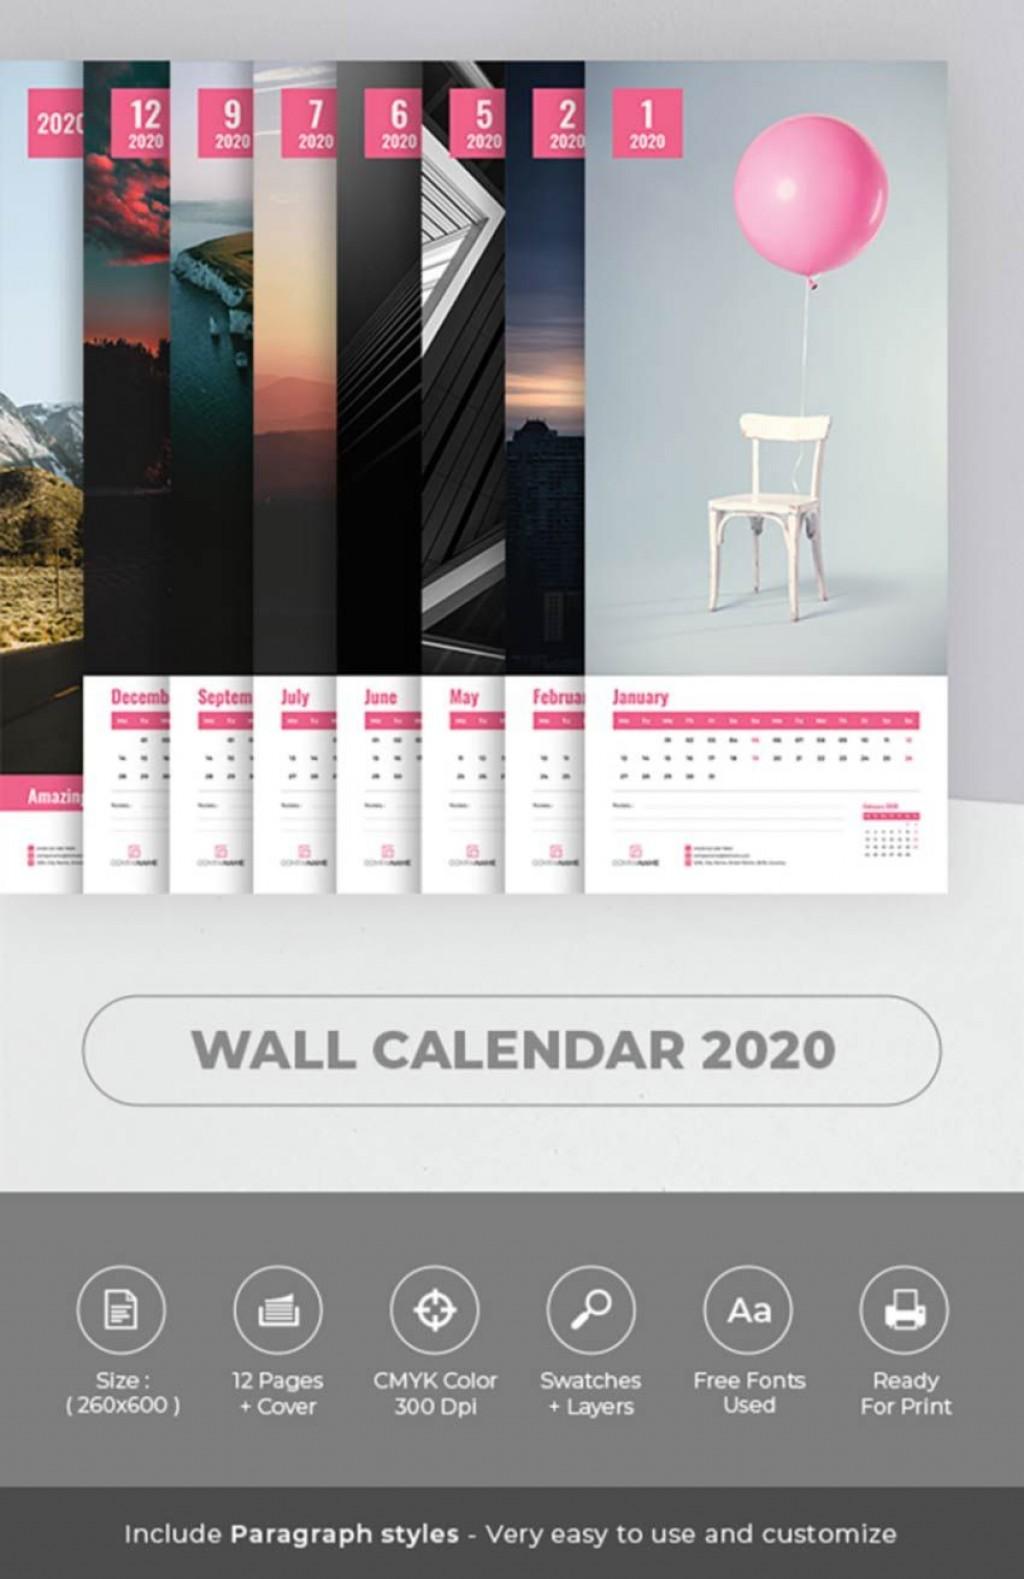 004 Wondrou 2020 Calendar Template Indesign Highest Quality  Adobe FreeLarge